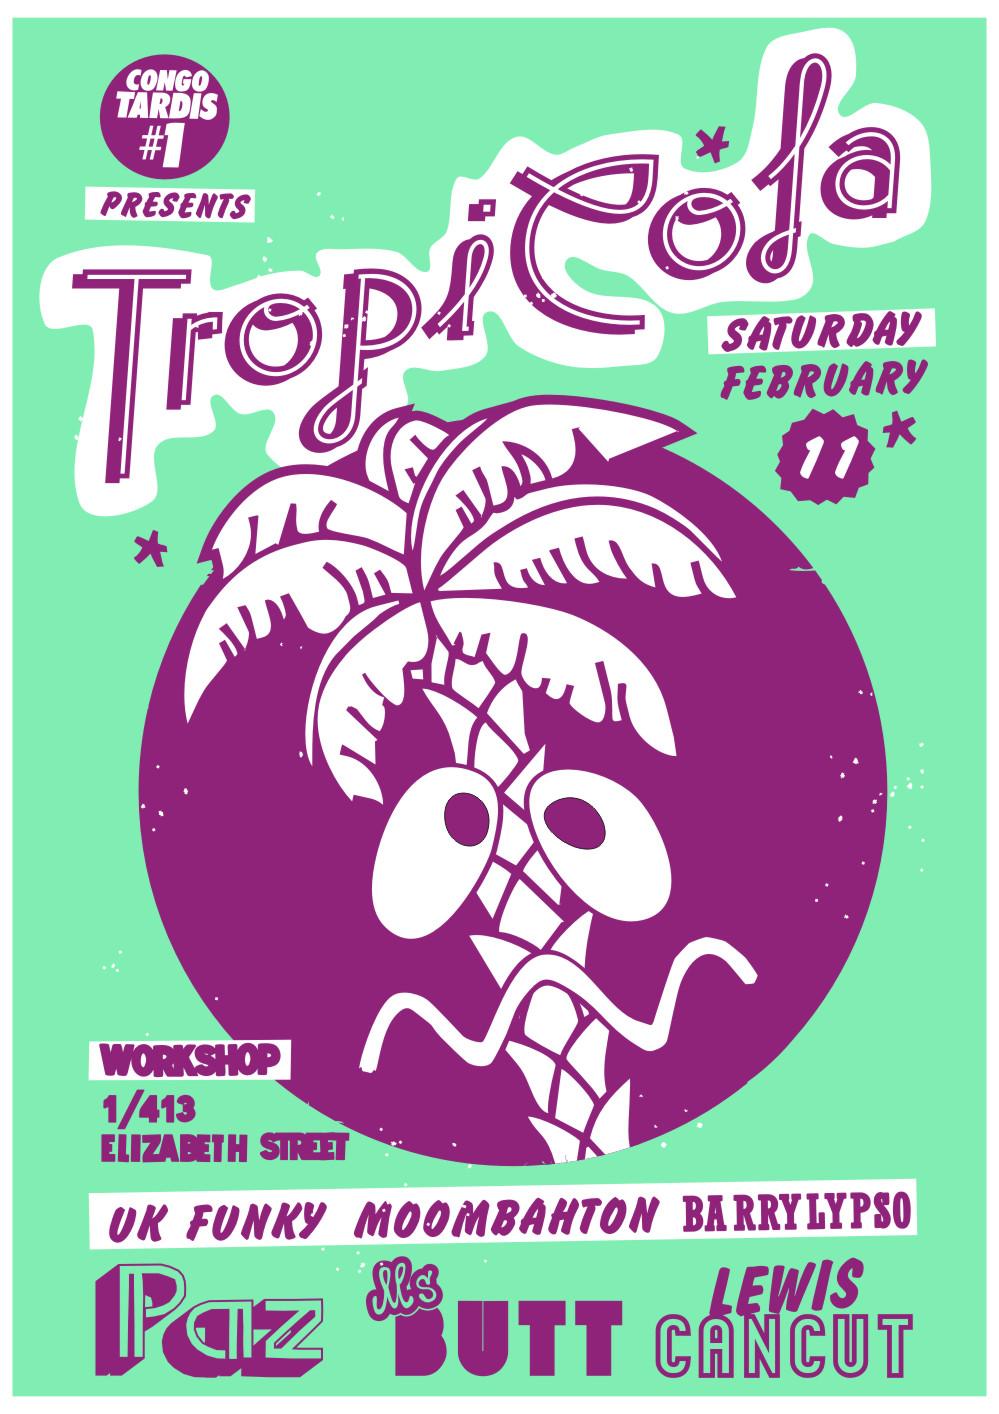 Tropicola - Workshop - Feb 11th 2012